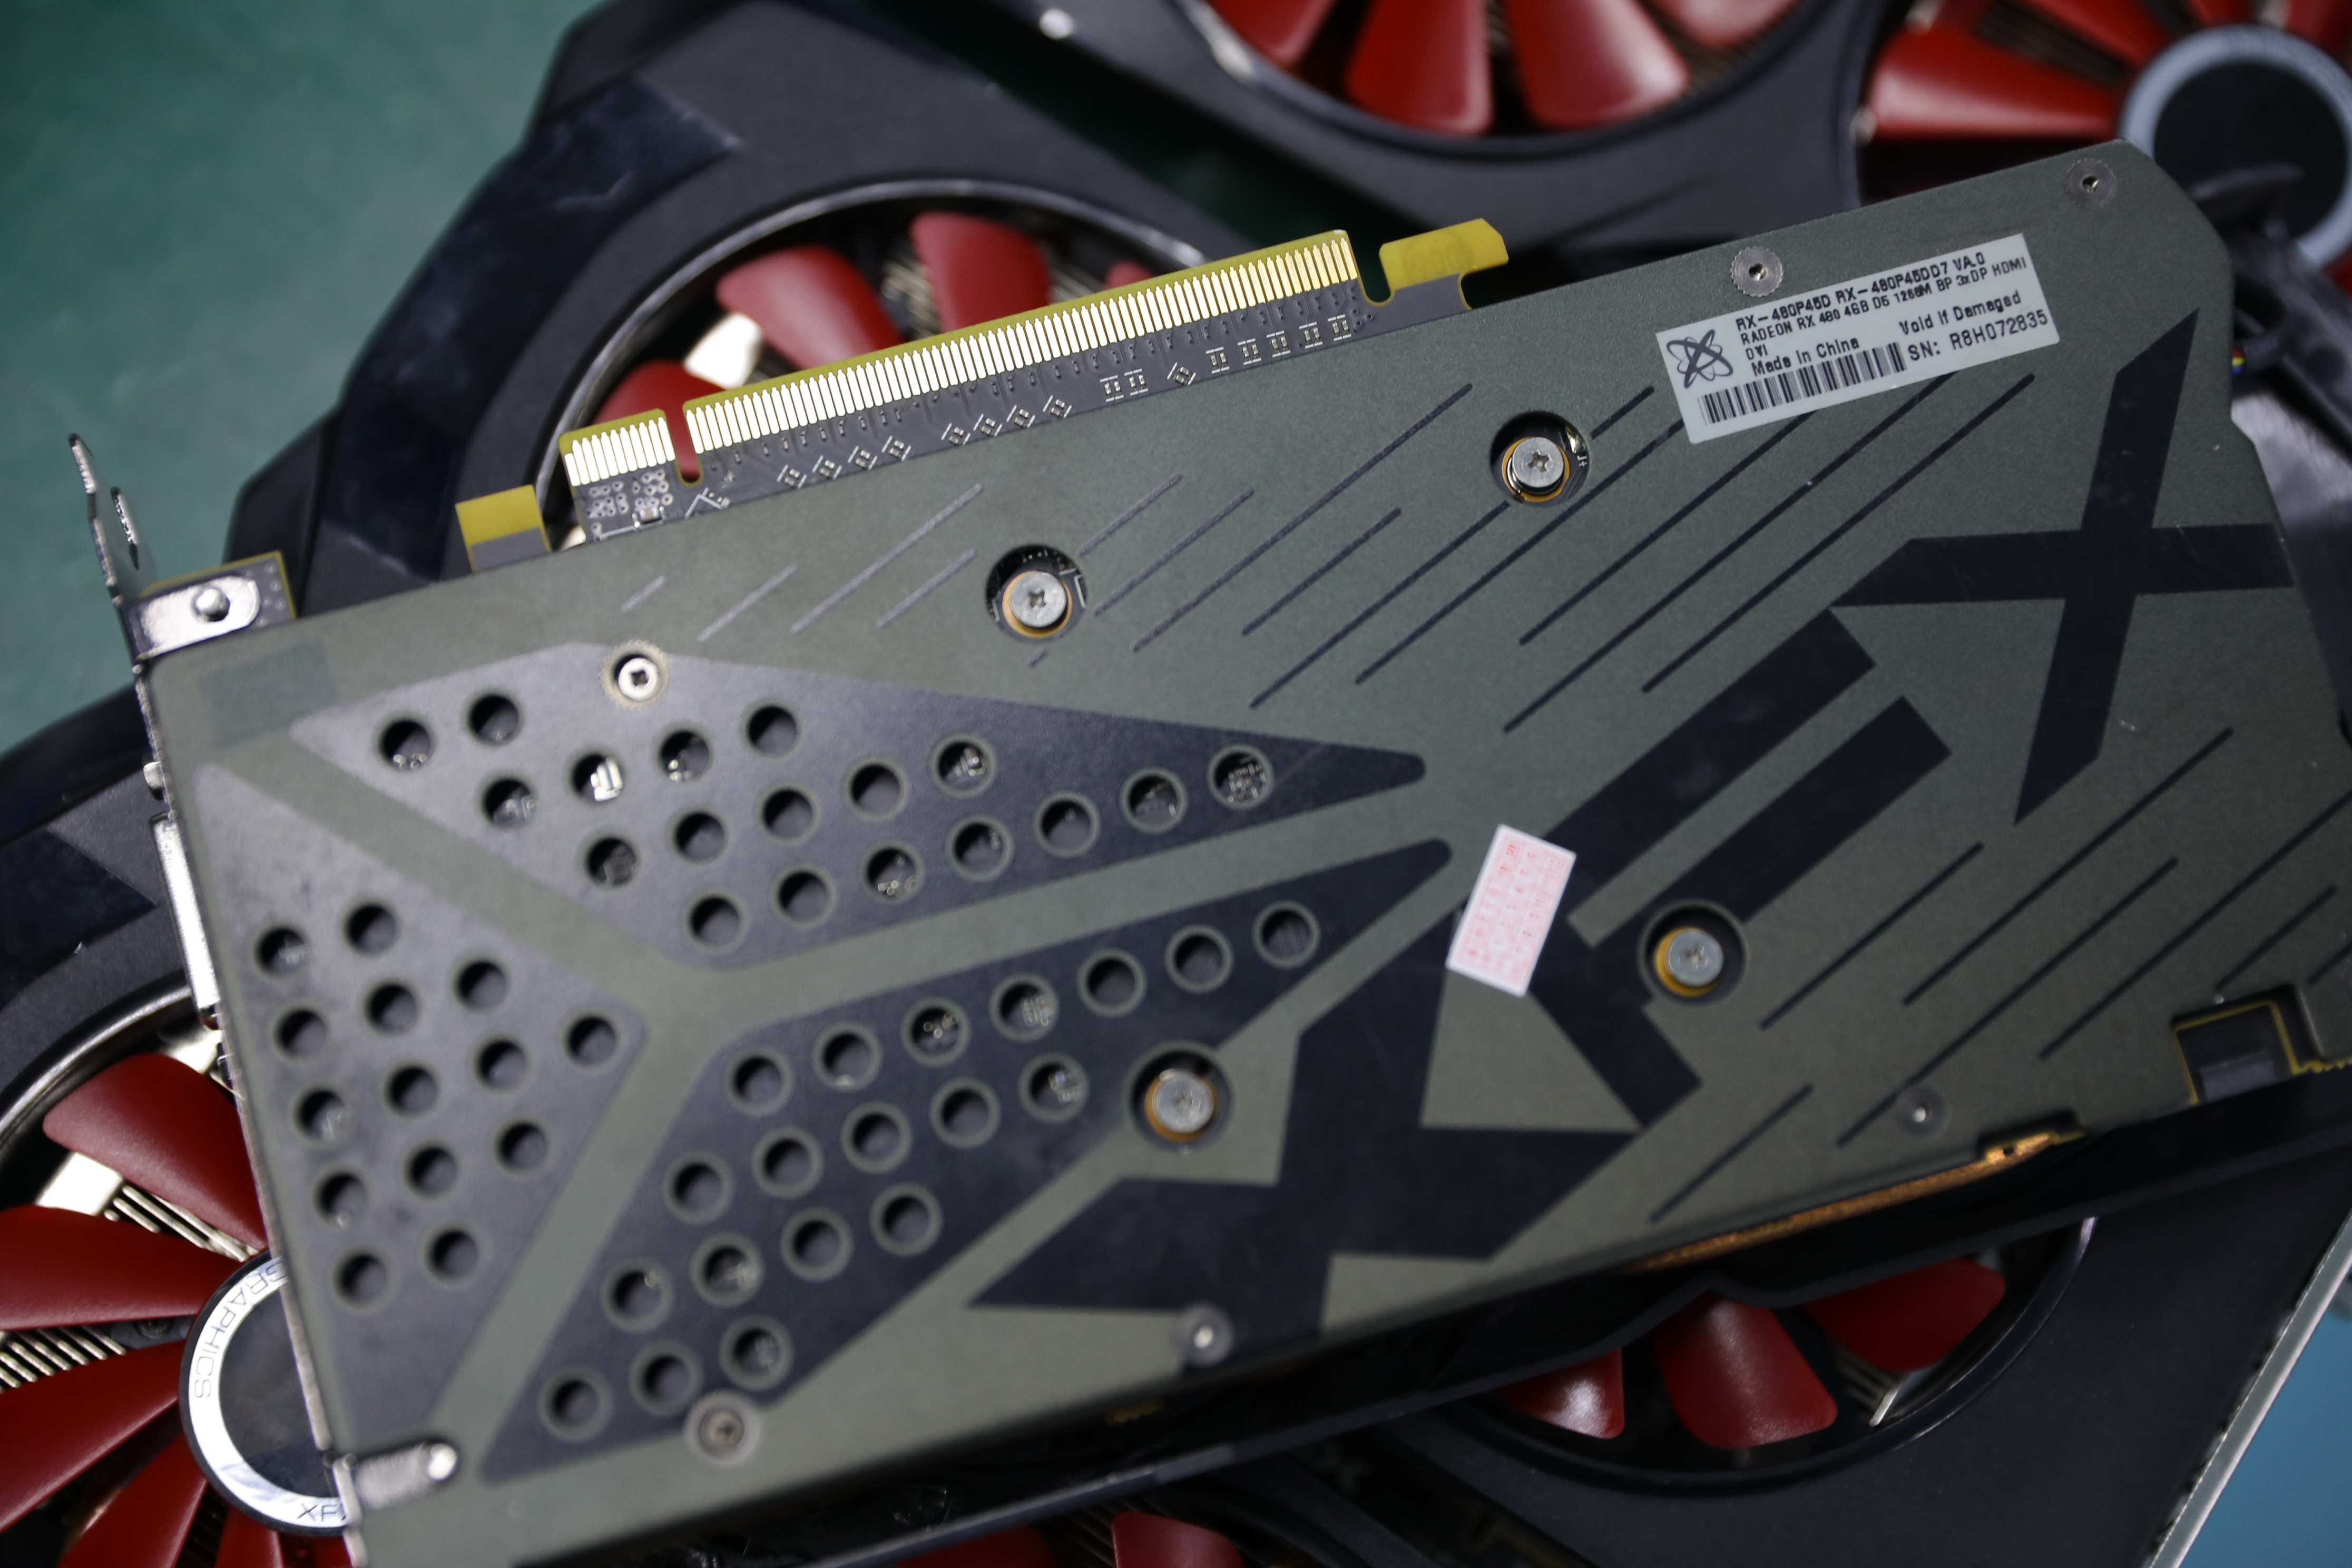 Used original XFX RX 480 4GB 256bit GDDR5 pc gaming graphics cards video card 480 4g 570 4gb xfx rx 480 4g xfx rx 480 4 gb 5